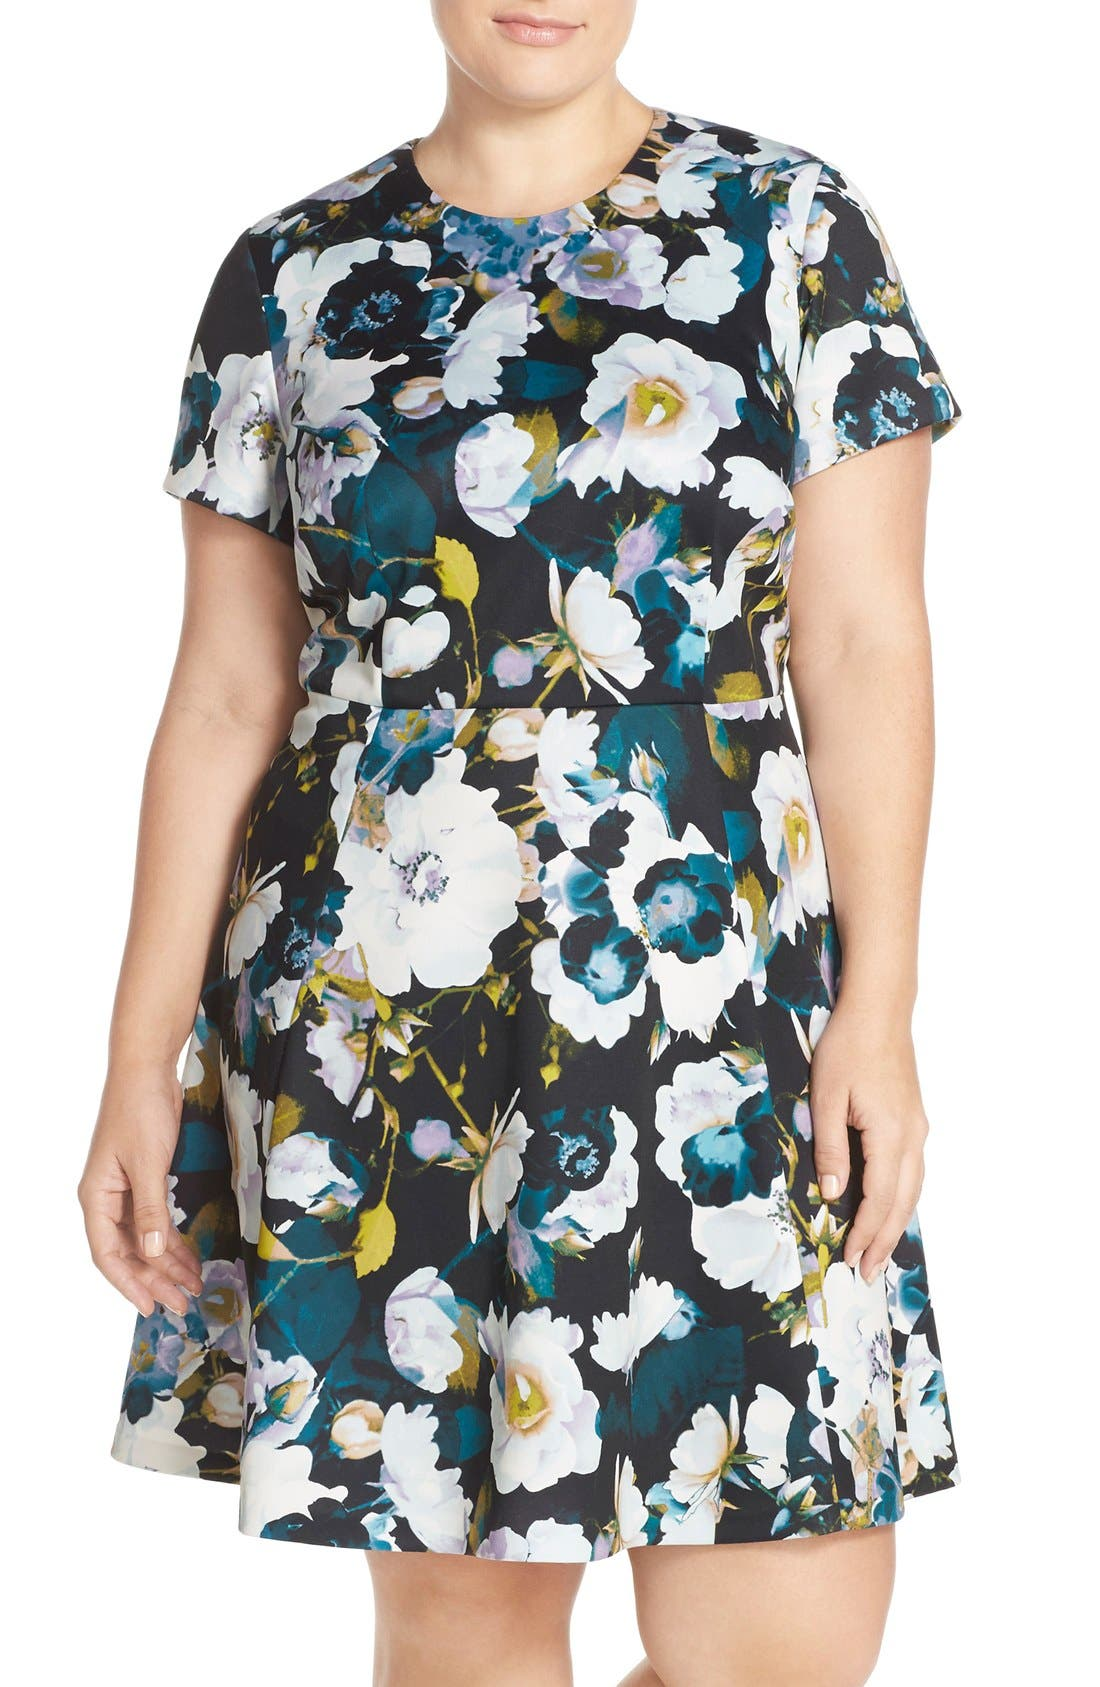 Alternate Image 1 Selected - Eliza J Floral Ponte Fit & Flare Dress (Plus Size)